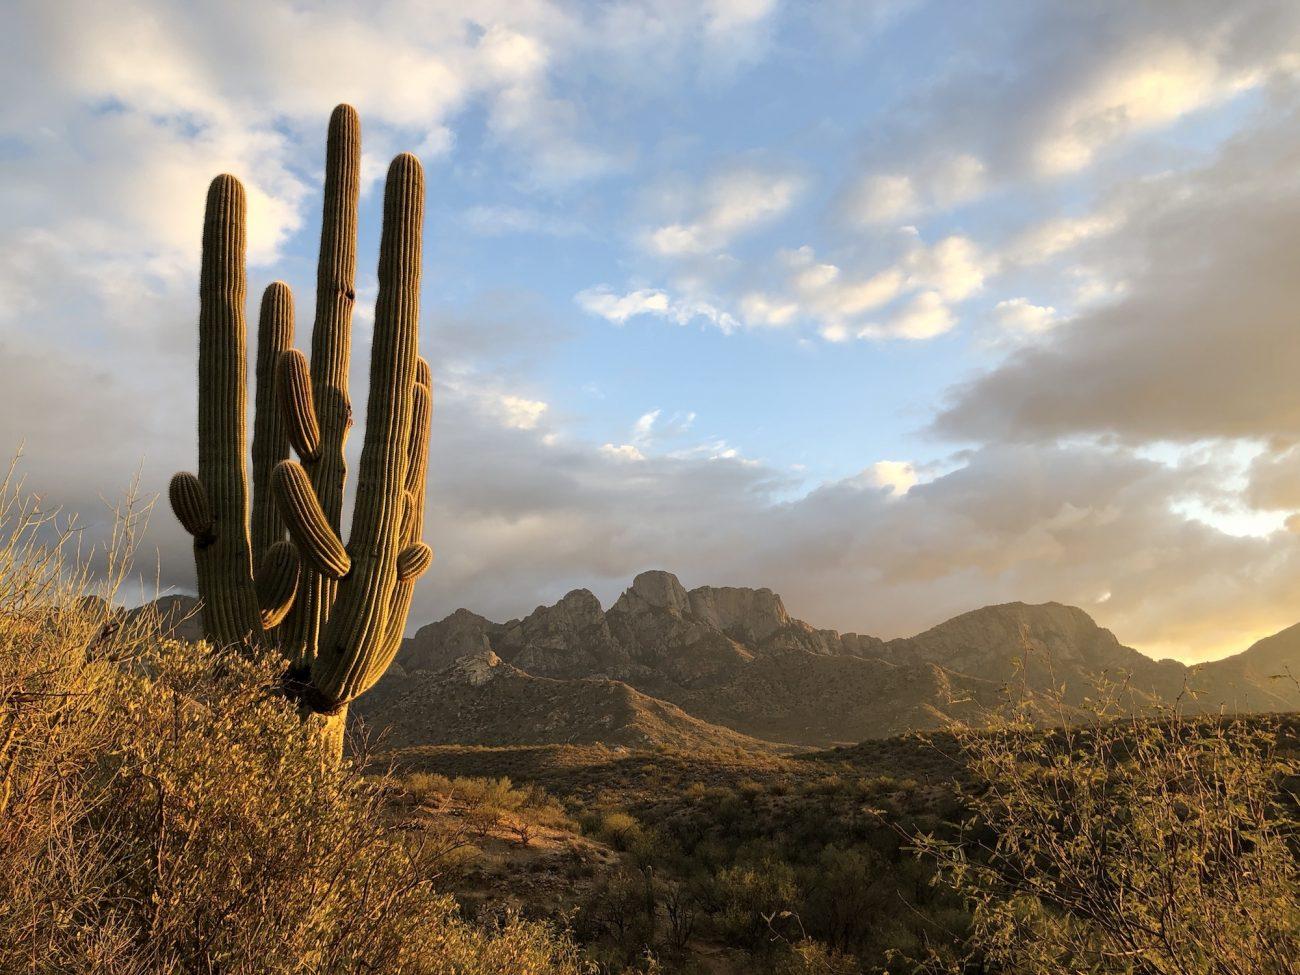 Saguaro Cactus at Catalina State Park